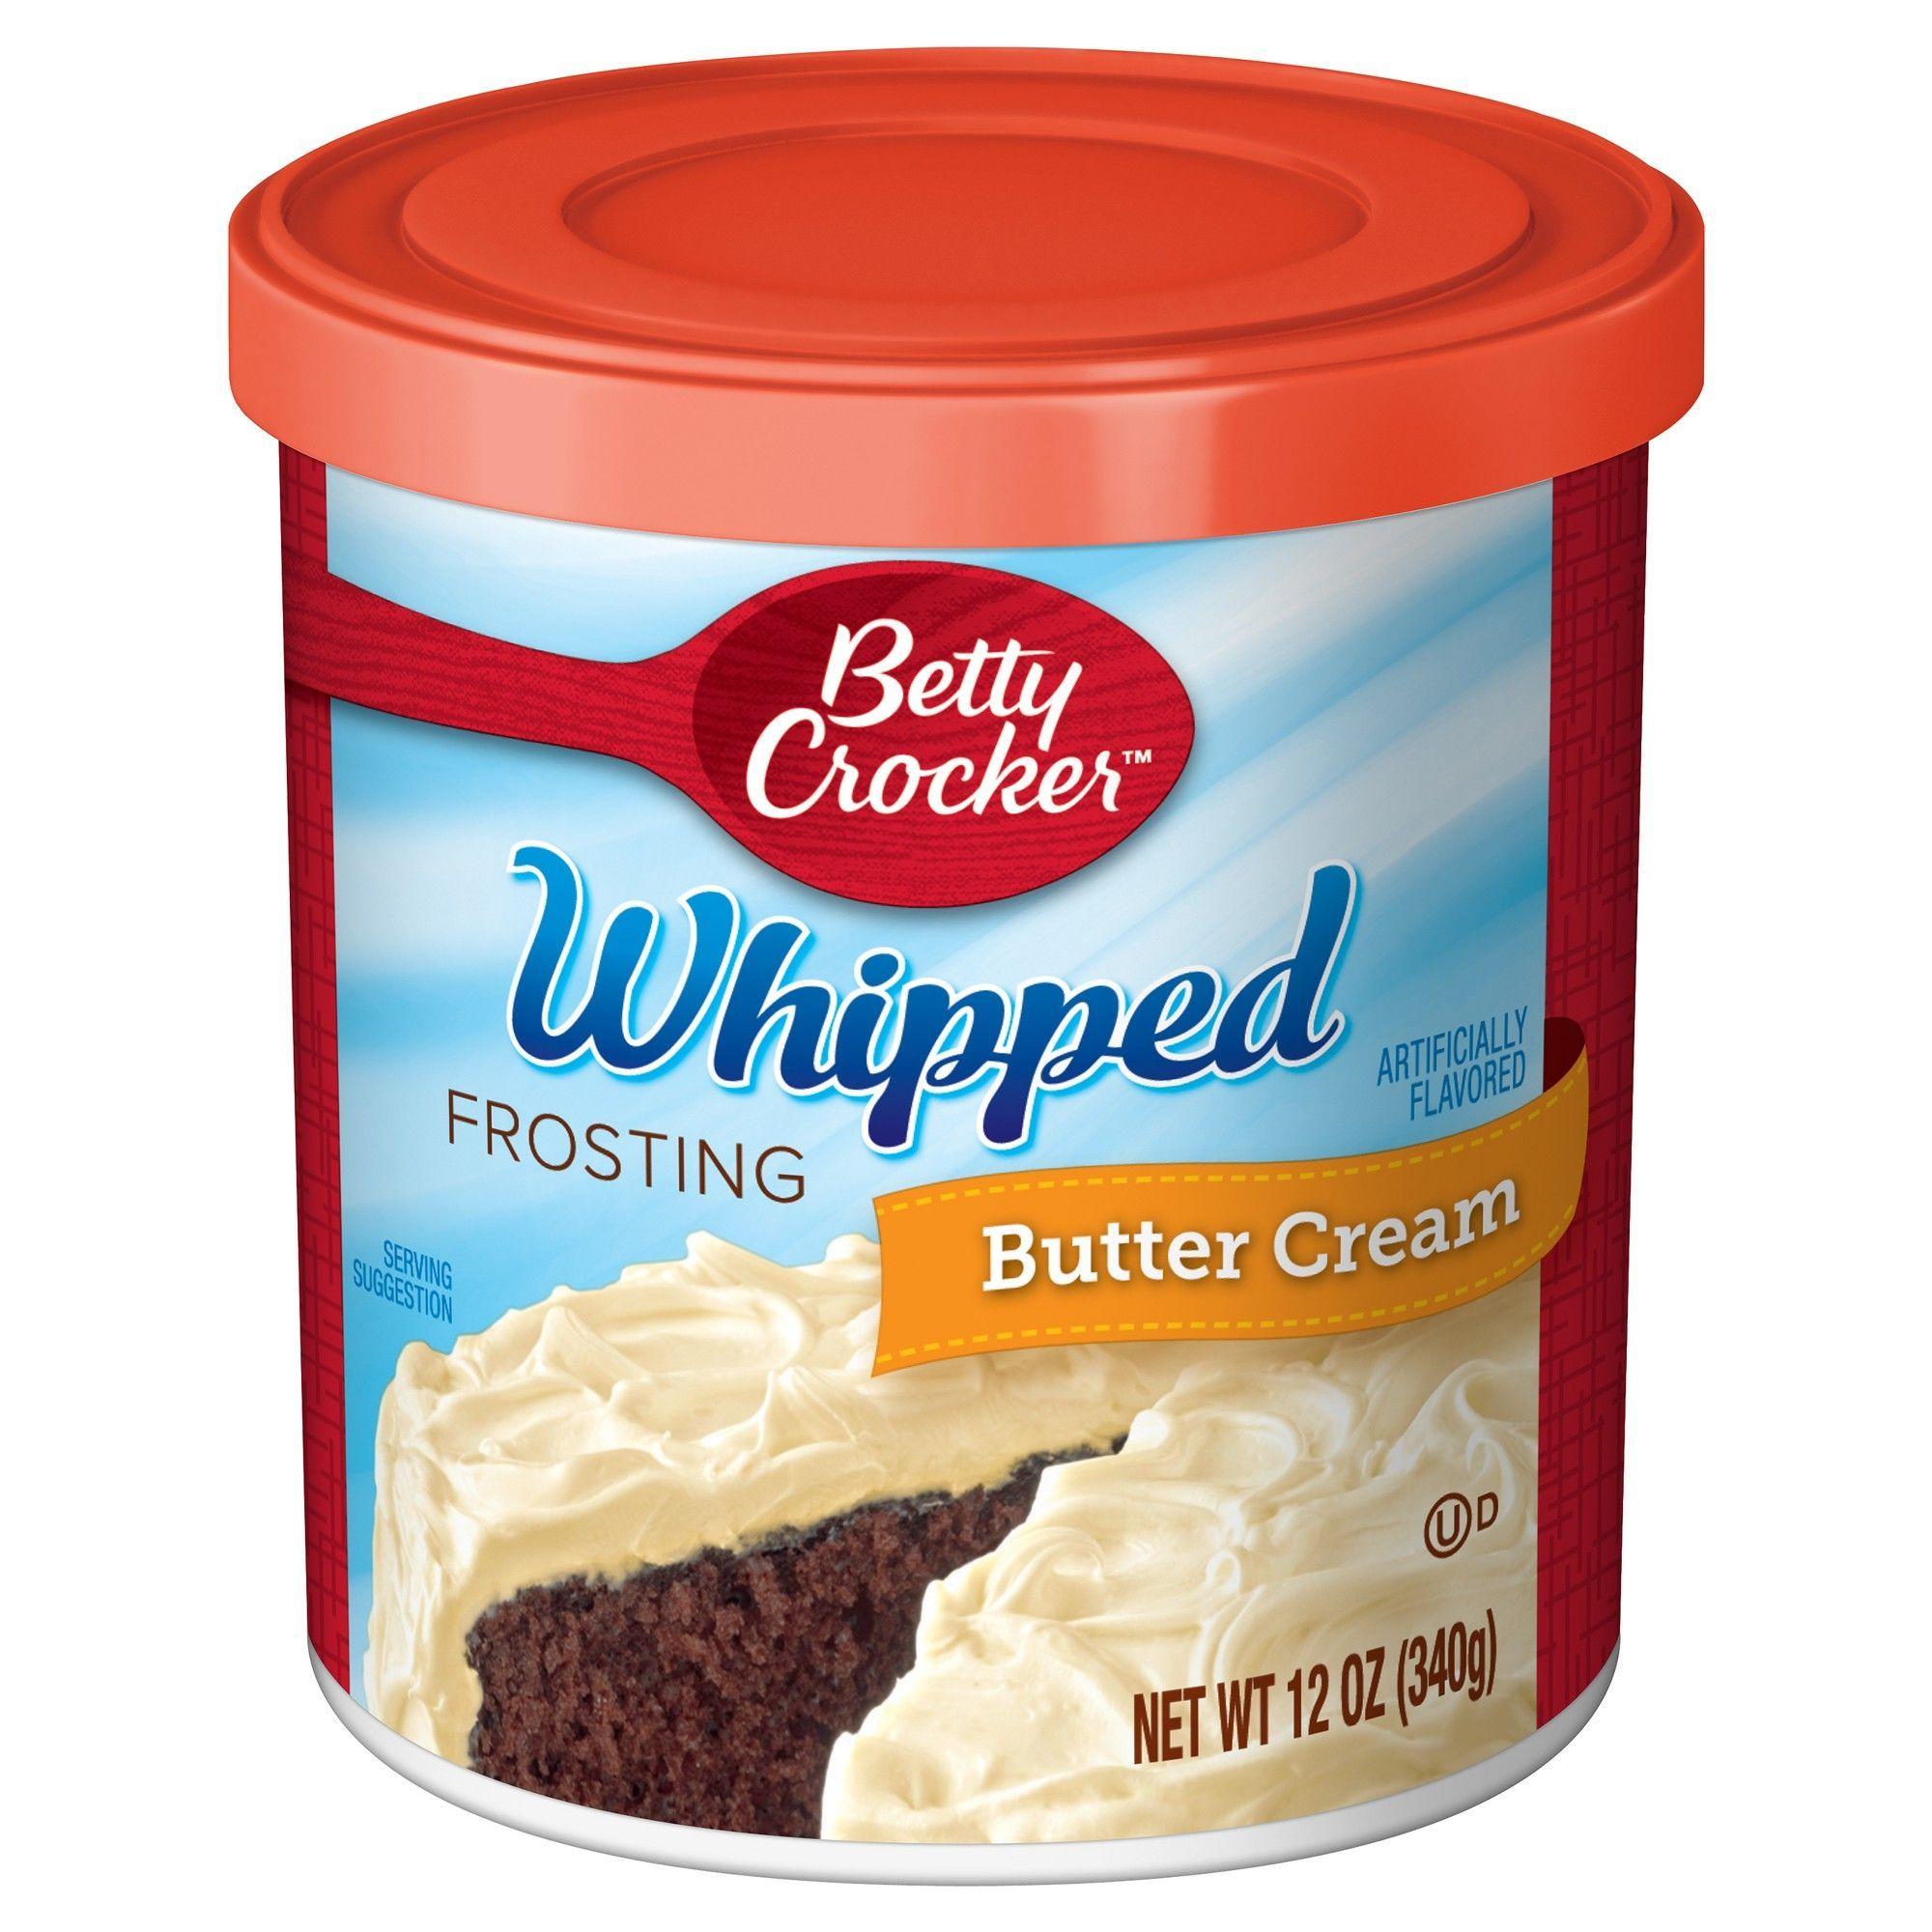 Betty crocker whipped butter cream frosting 12oz